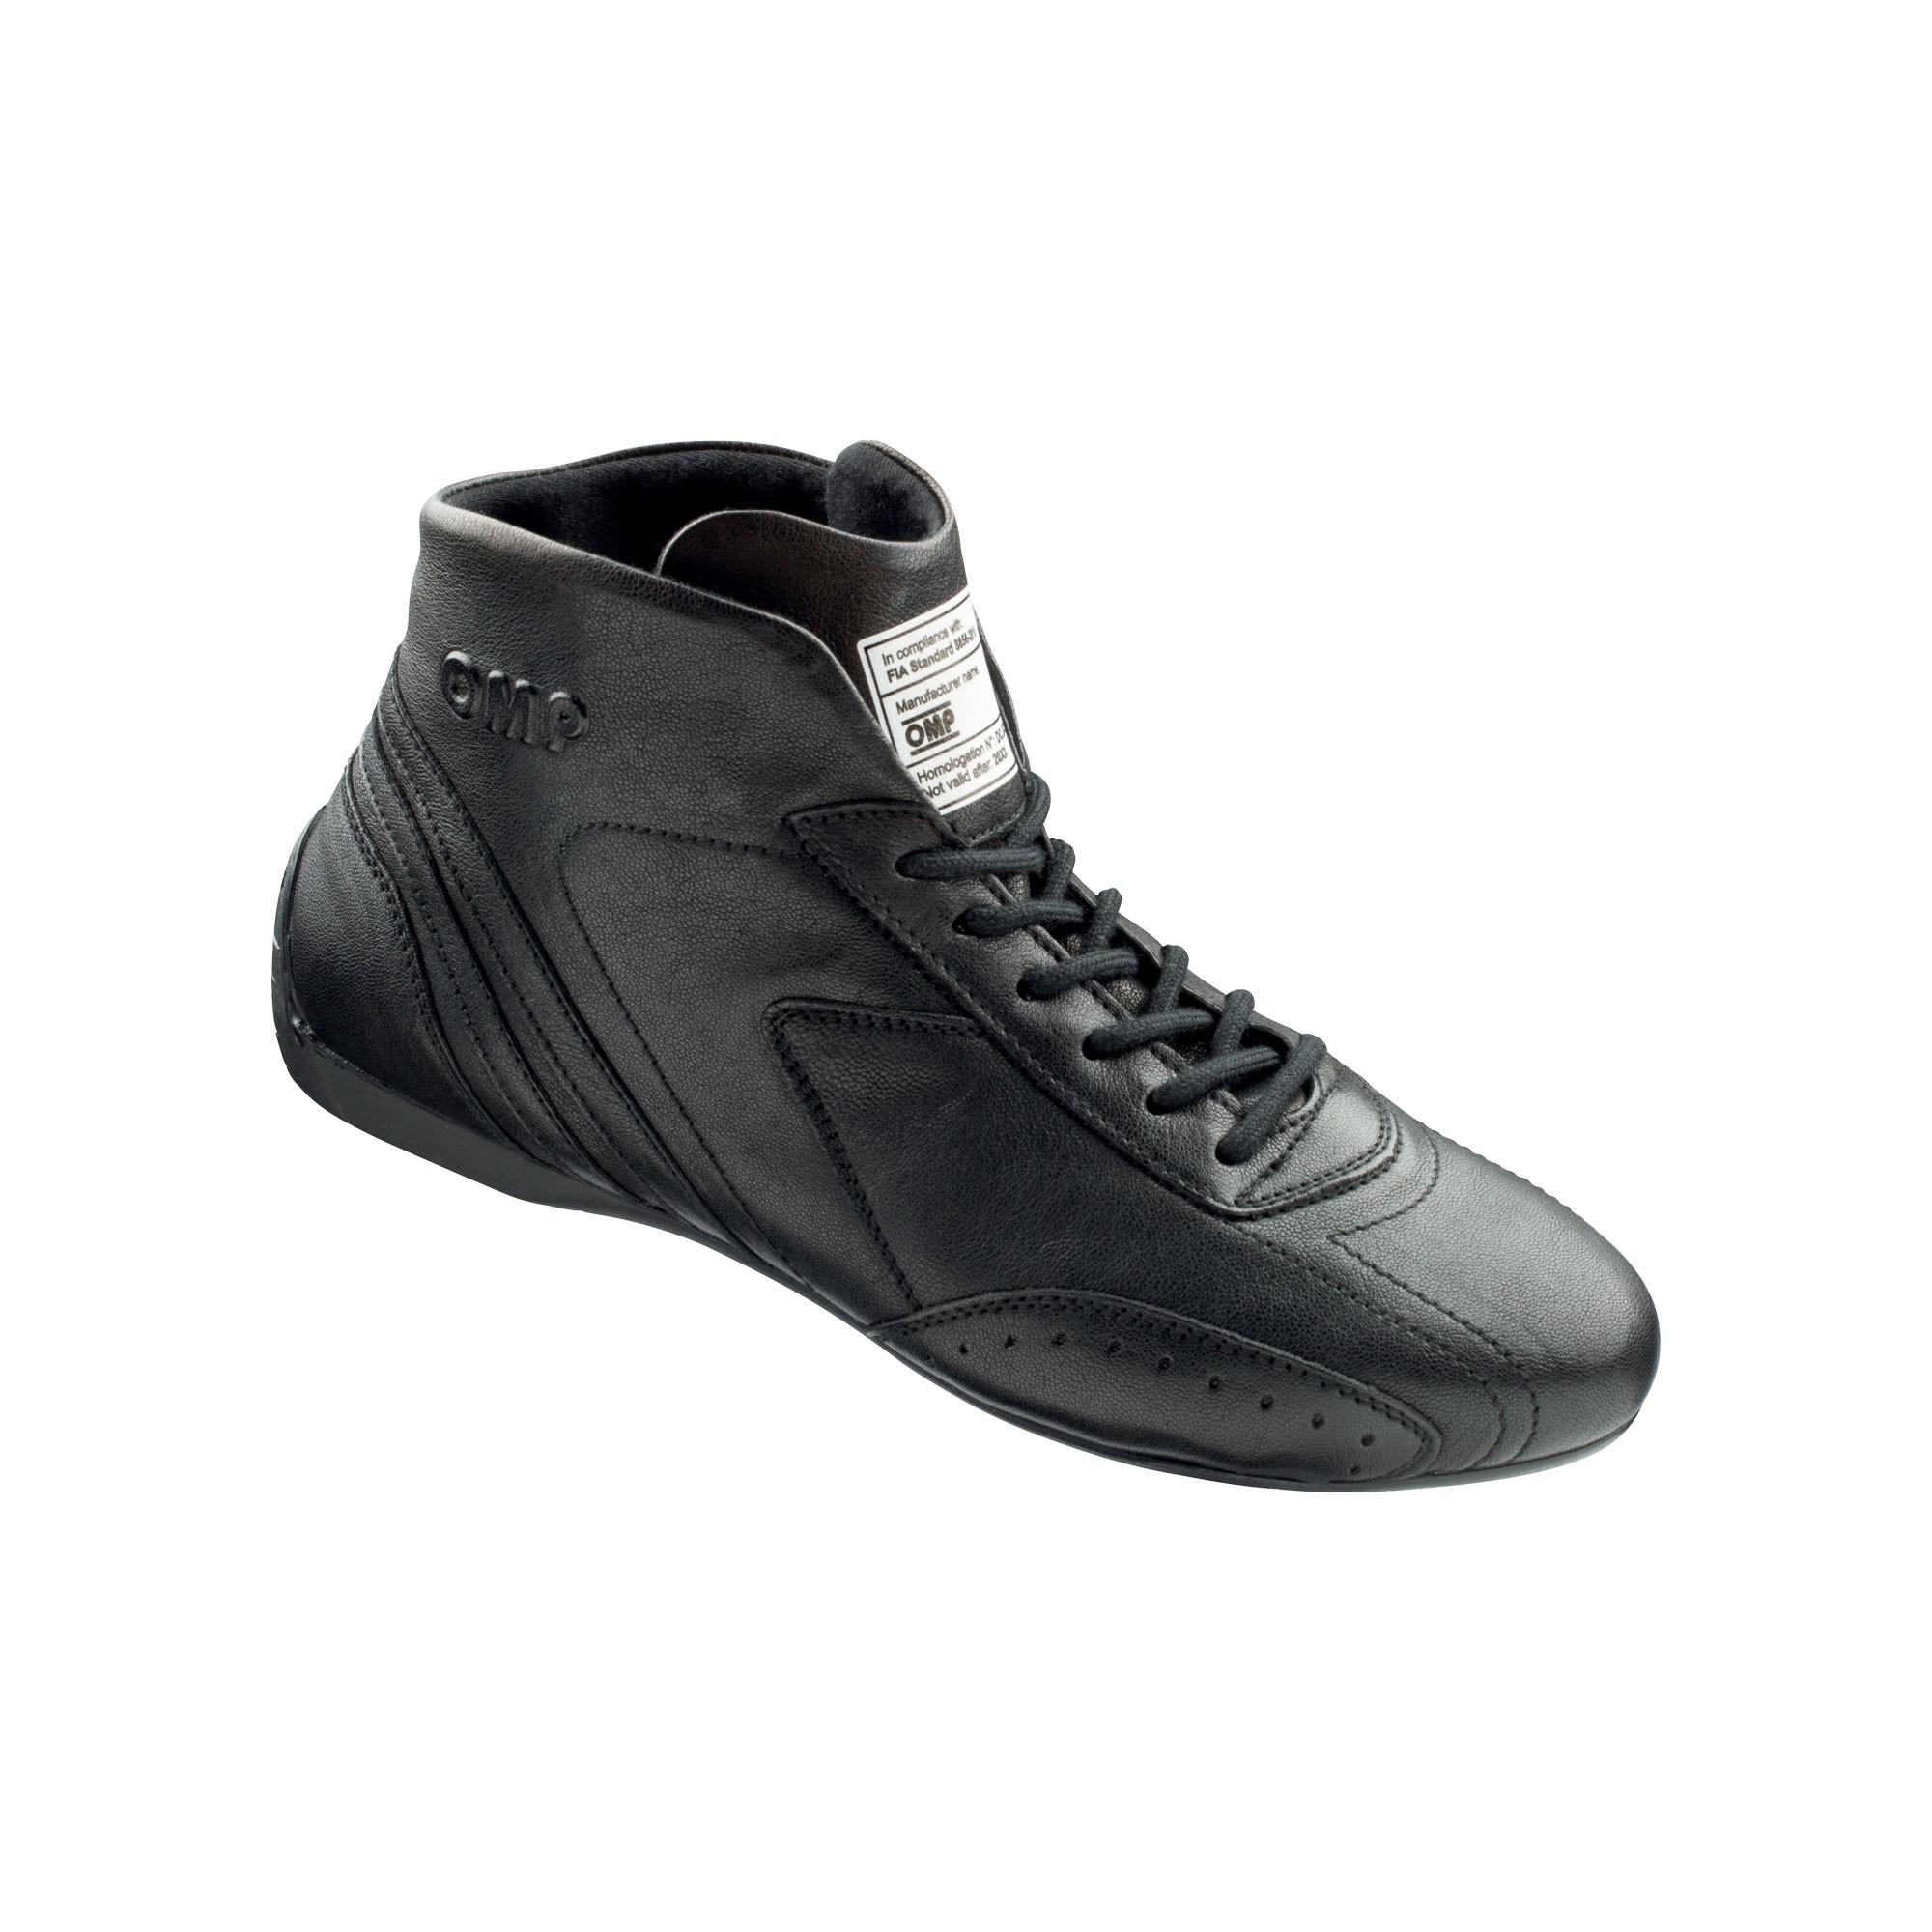 CARRERA LOW BOOTS my2021 BLACK SIZE 37 FIA 8856-2018